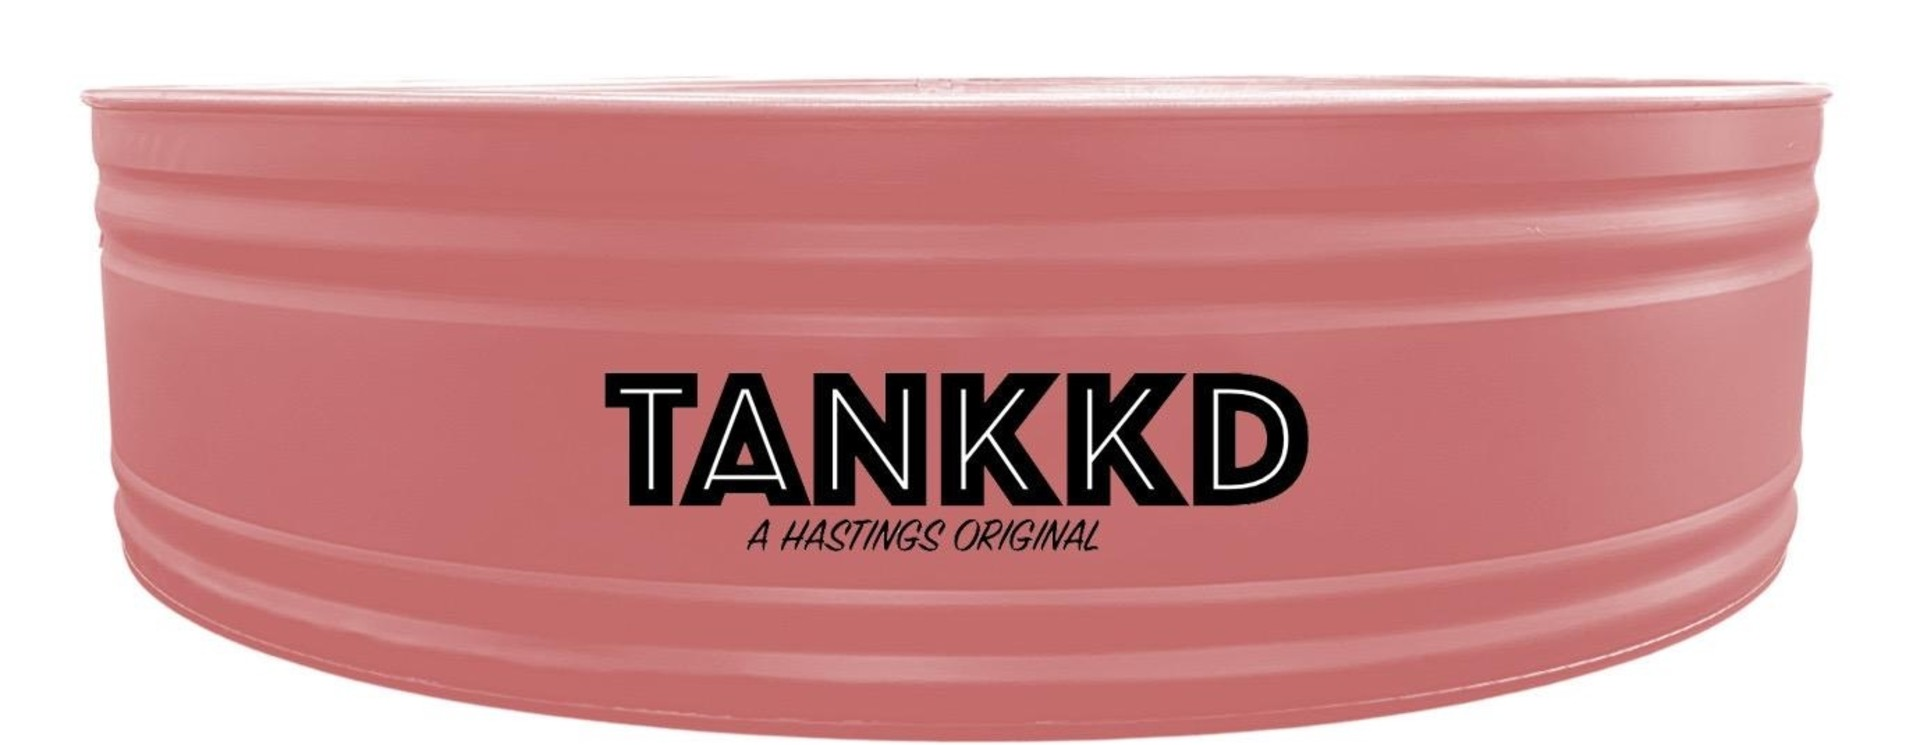 Tankkd/Hastings stock tanks  painted